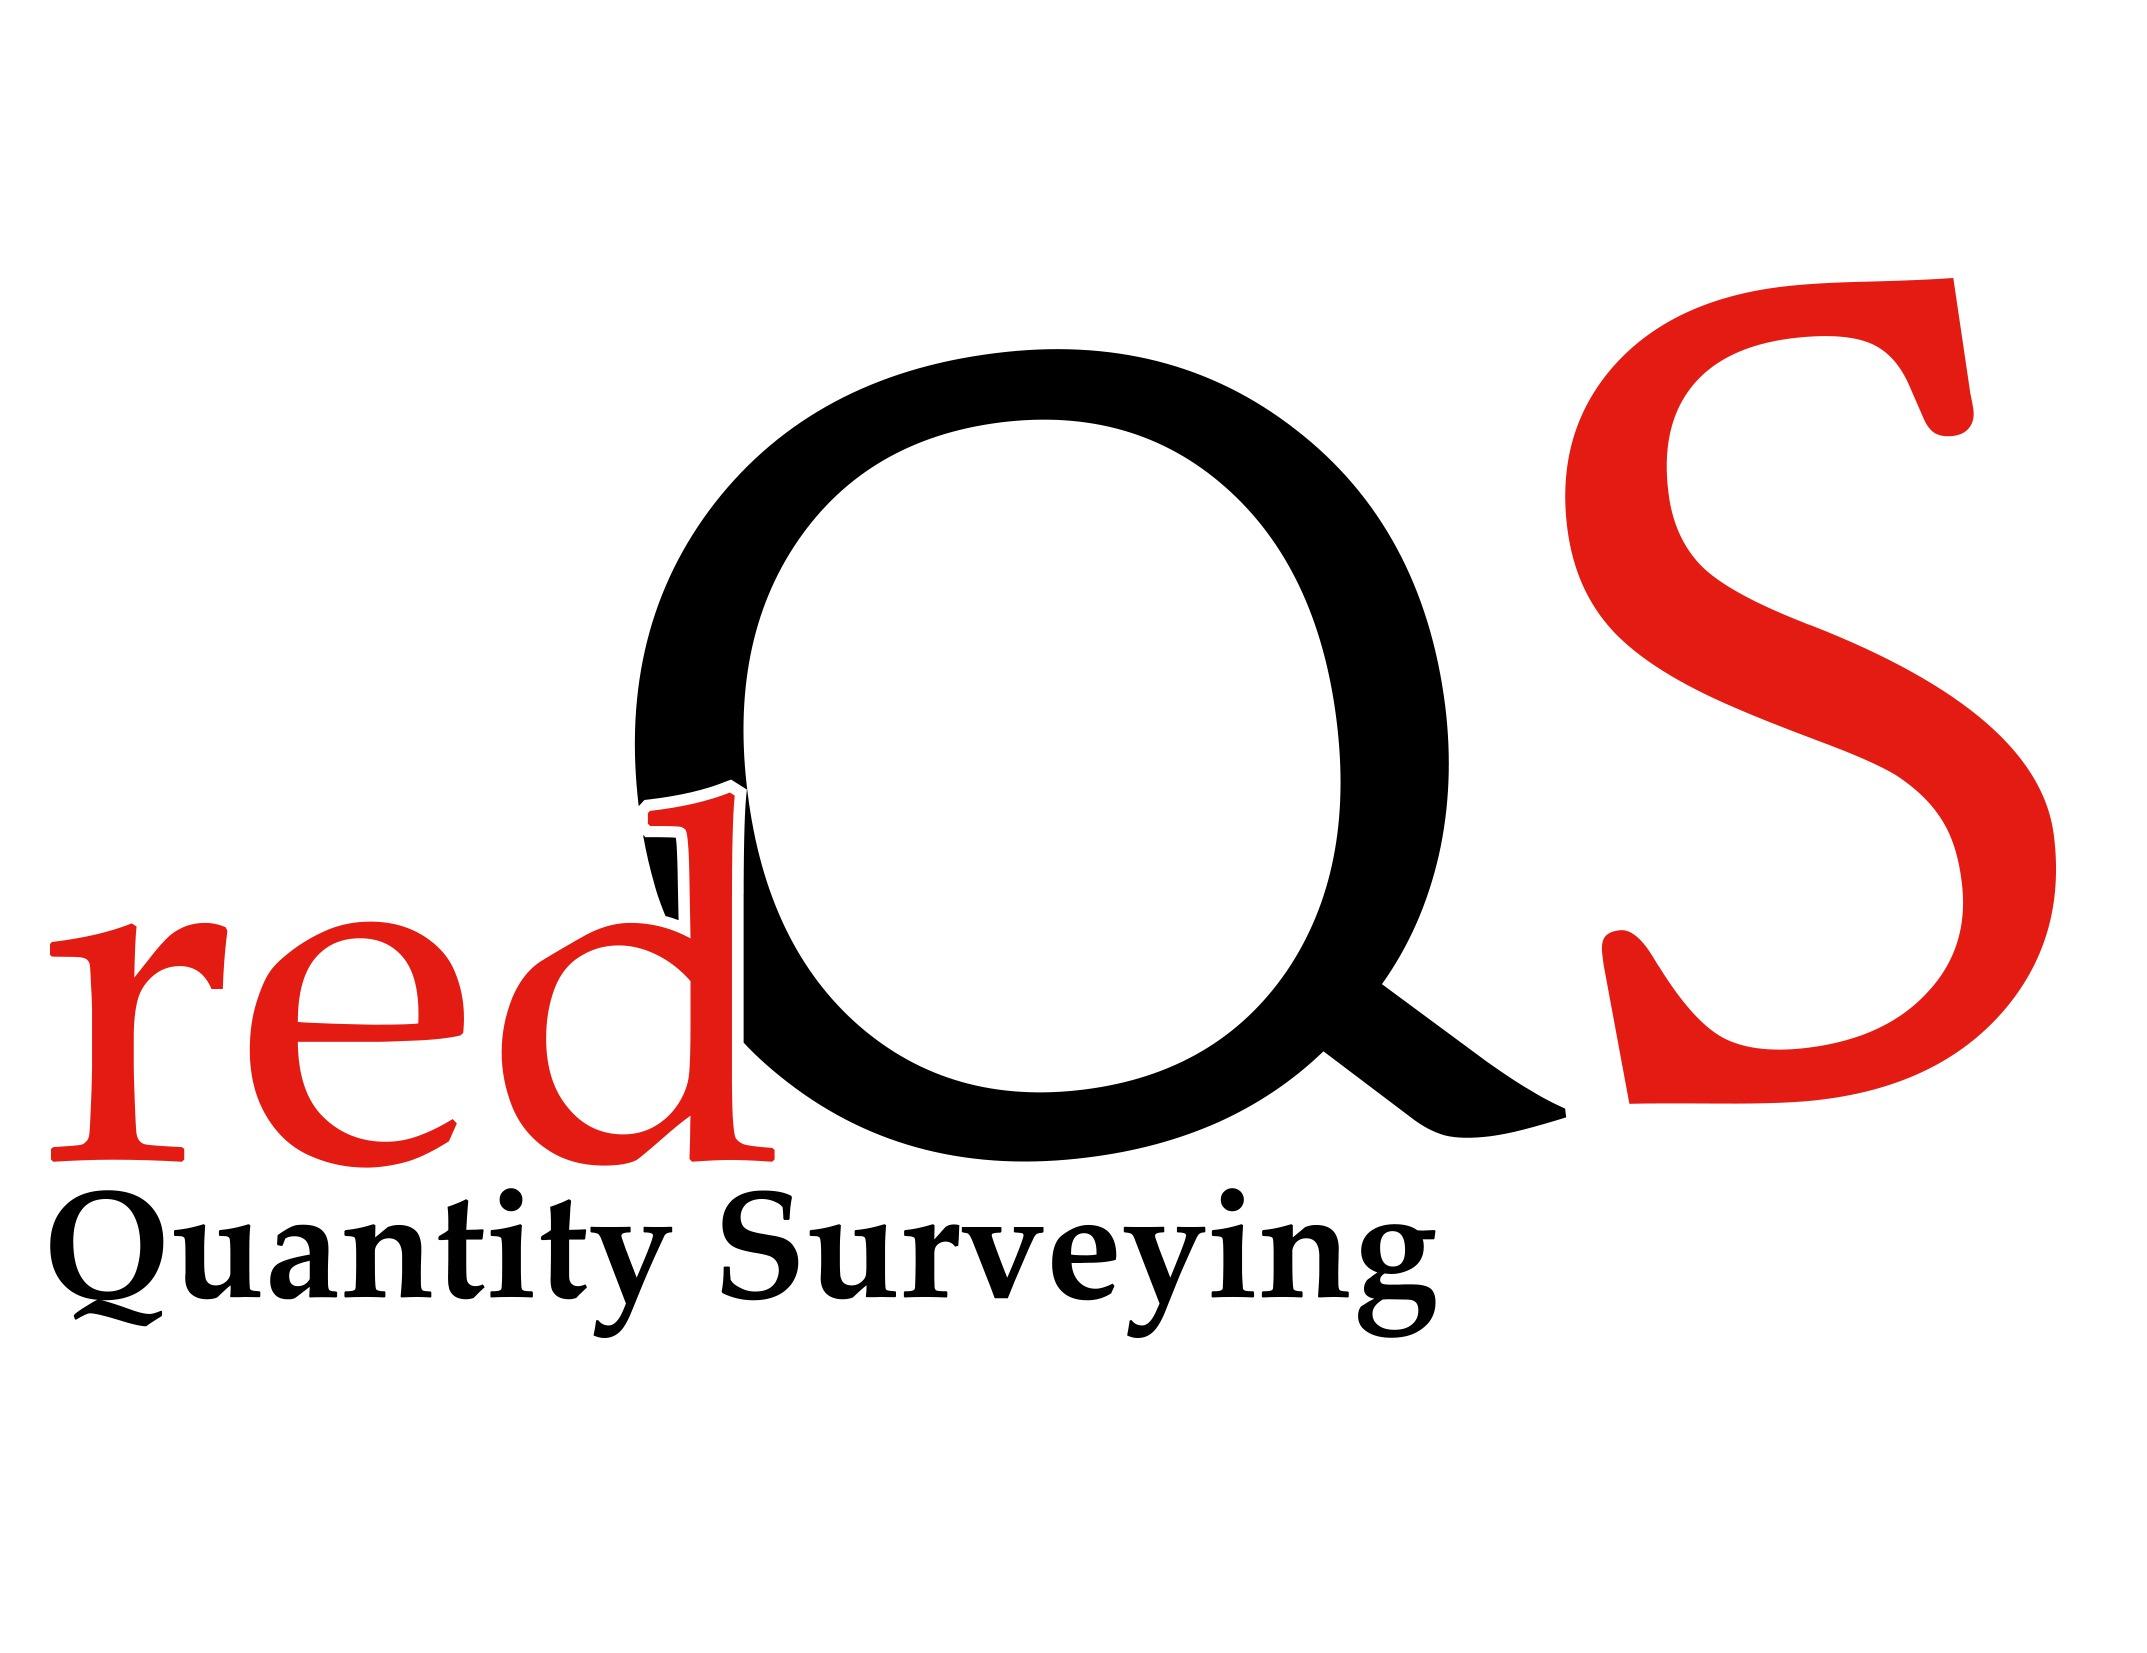 Red Quantity Surveying